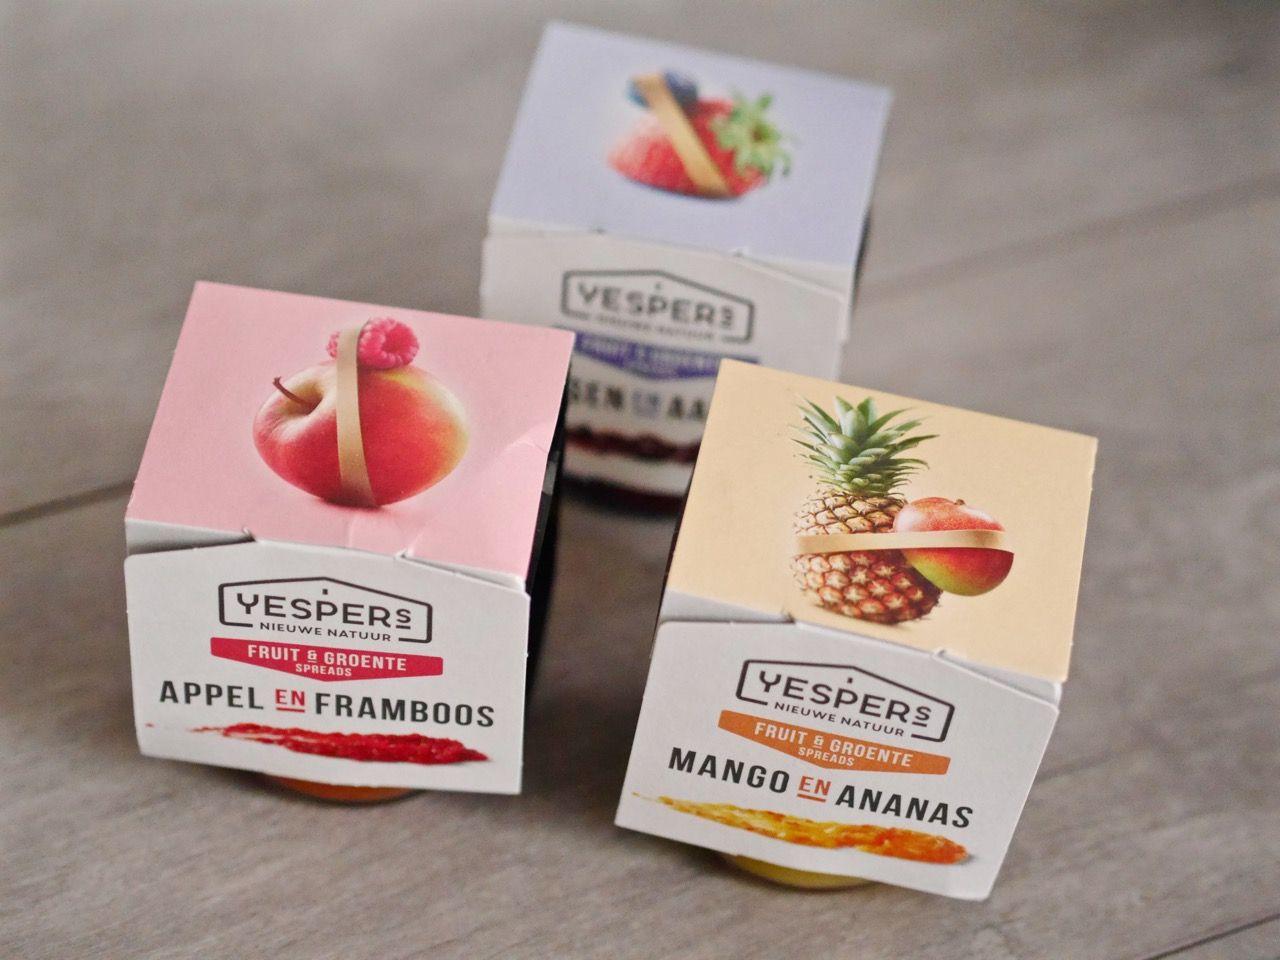 Yespers fruitspread